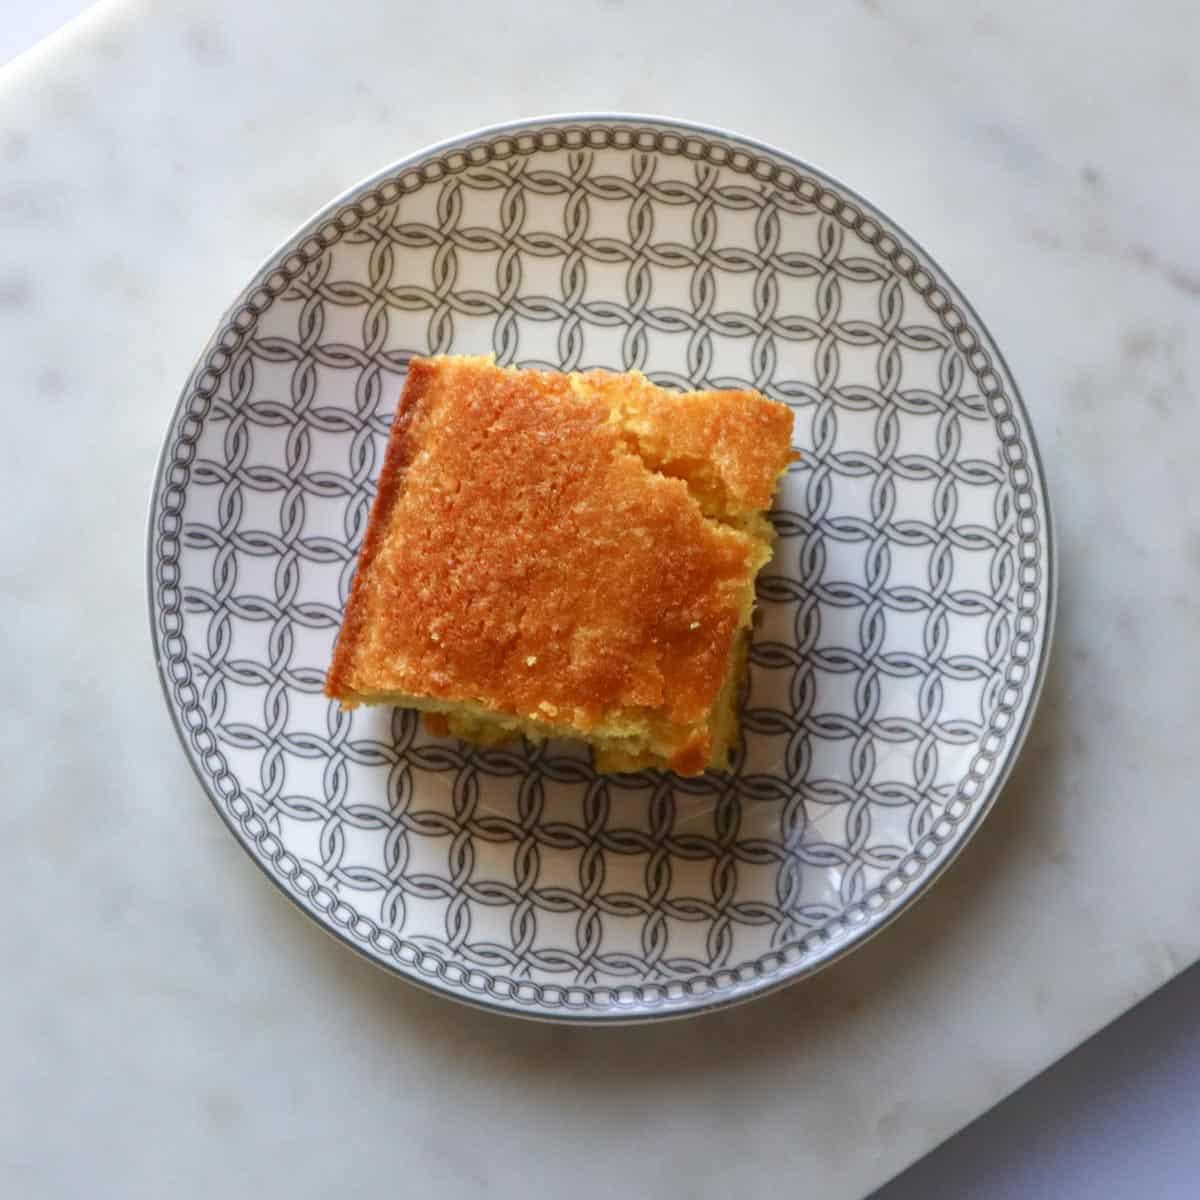 sfouf piece of turmeric cake on a plate